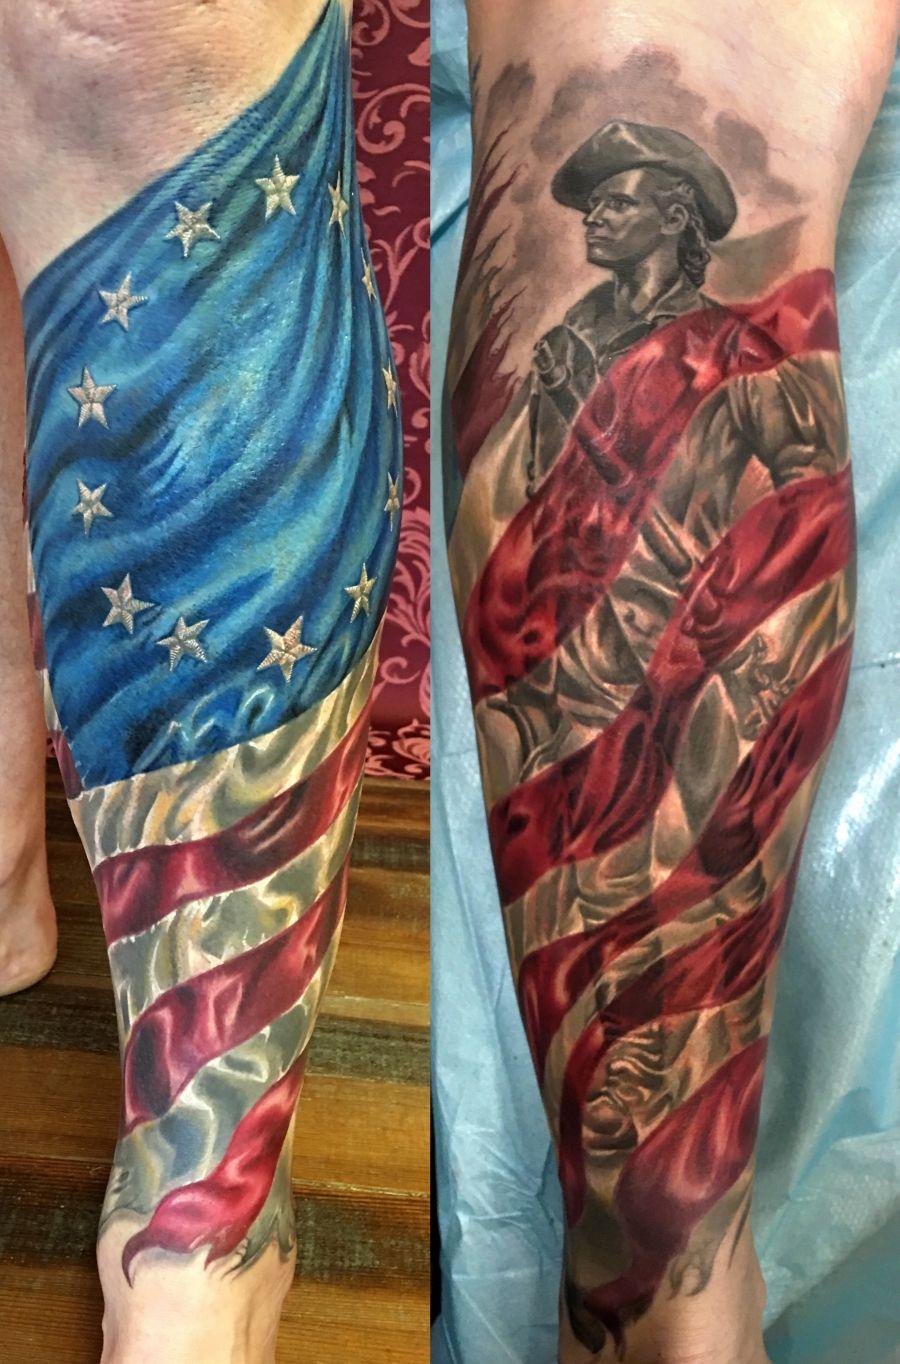 Urbane Minute Man Tattoo 2019 Tattoos For Guys Tattoos American Tattoos